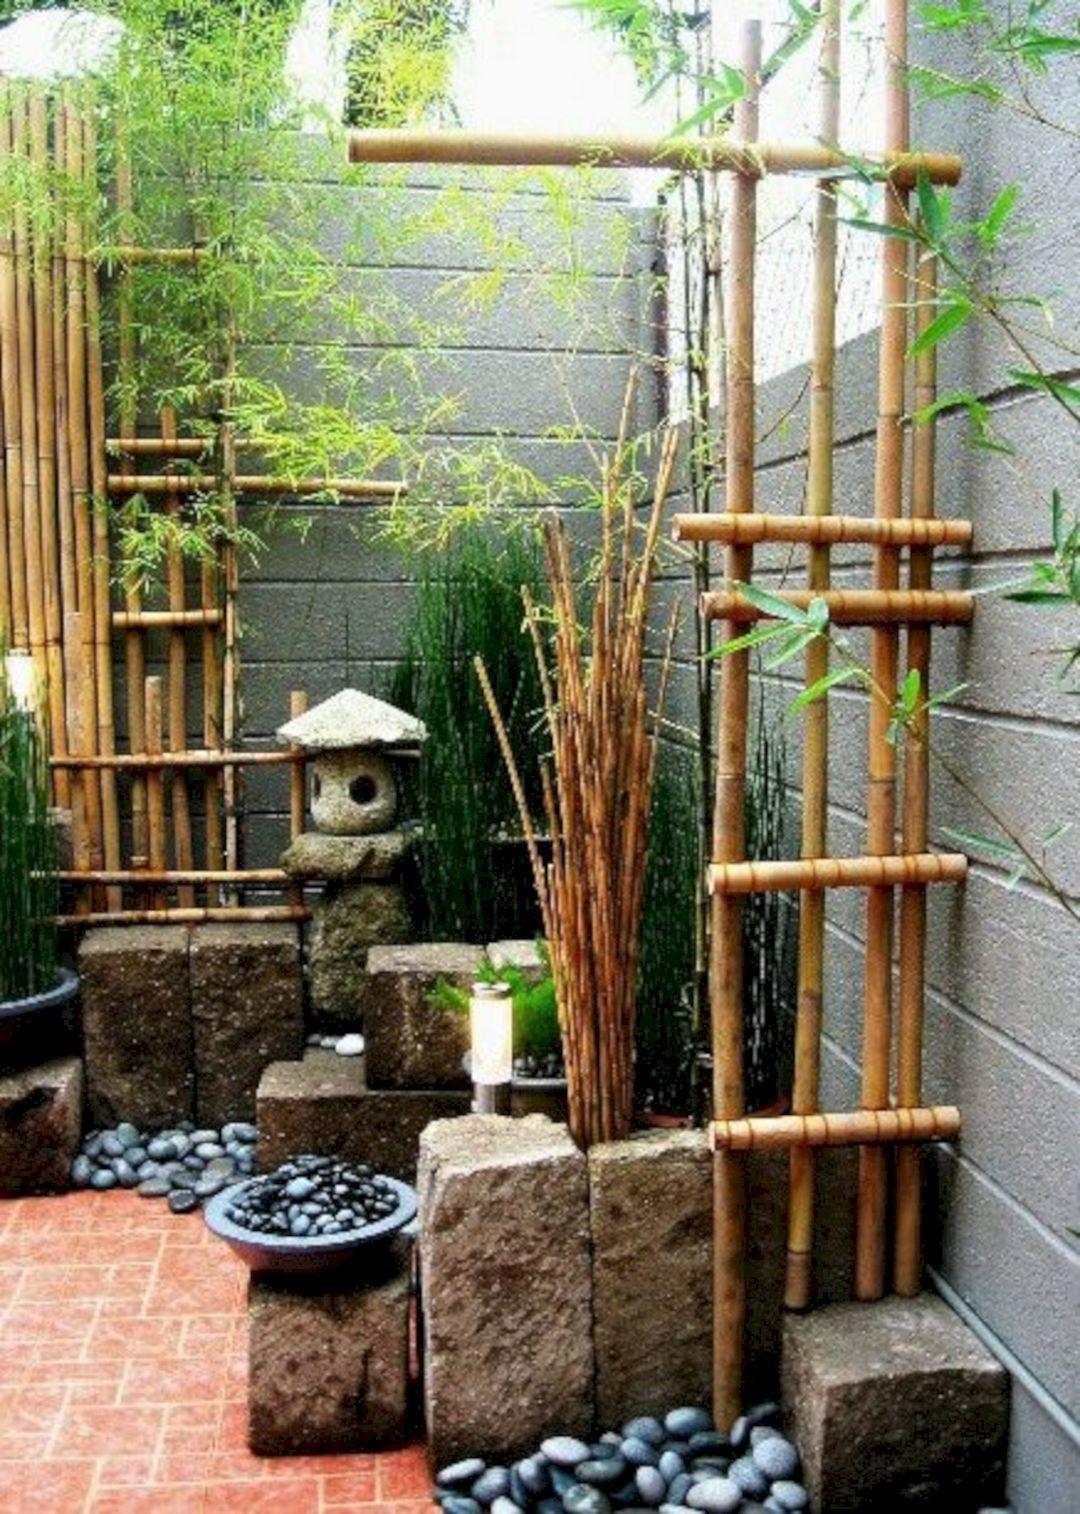 25 amazing minimalist indoor zen garden design ideas on inspiring trends front yard landscaping ideas minimal budget id=57329